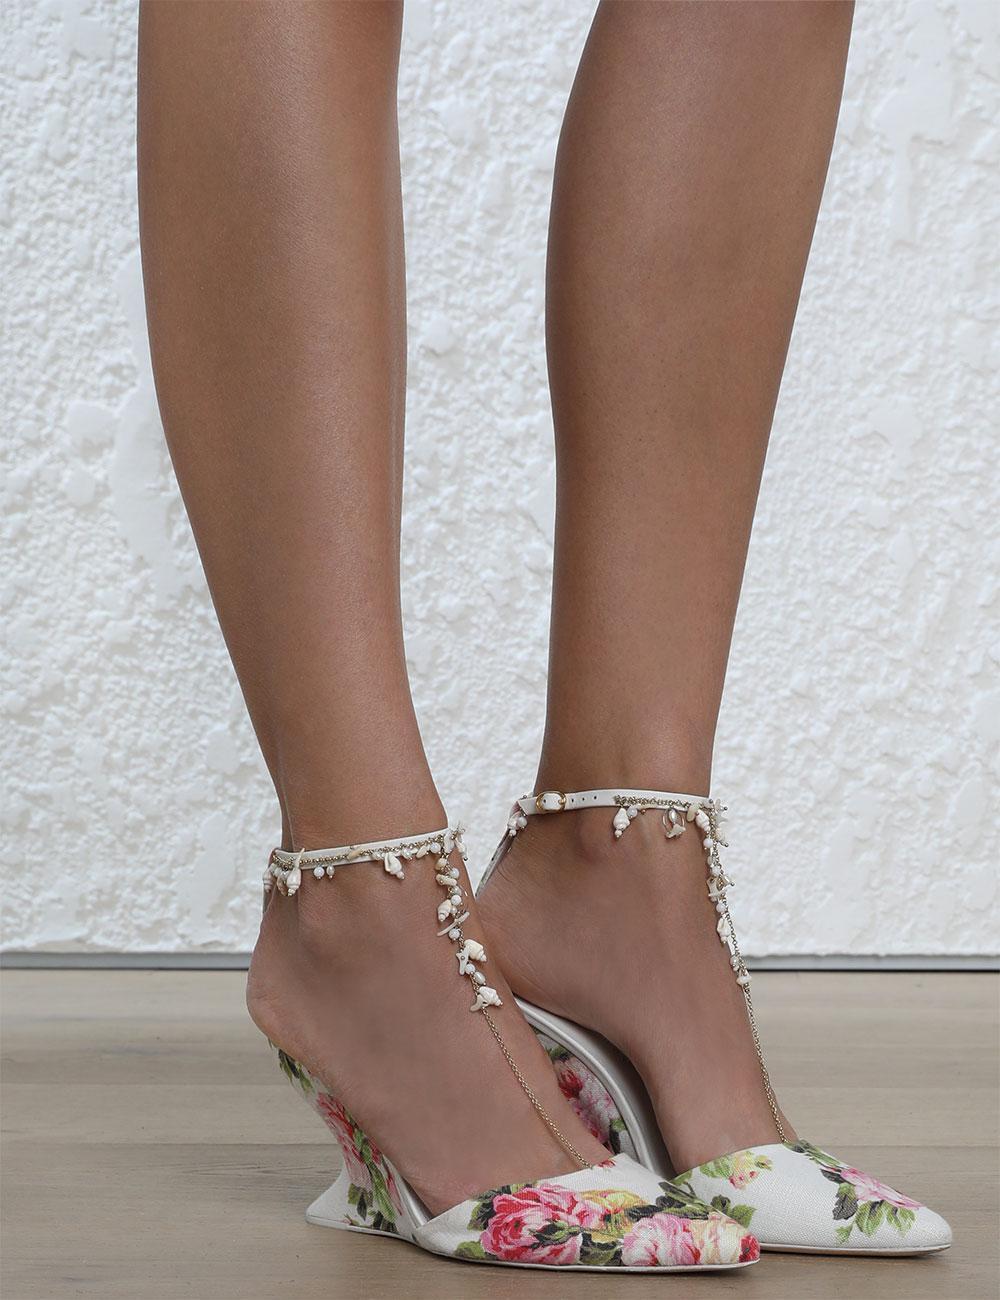 Zimmermann Runway Jeweled Wedge Heel shoes shoes shoes 0fdeee